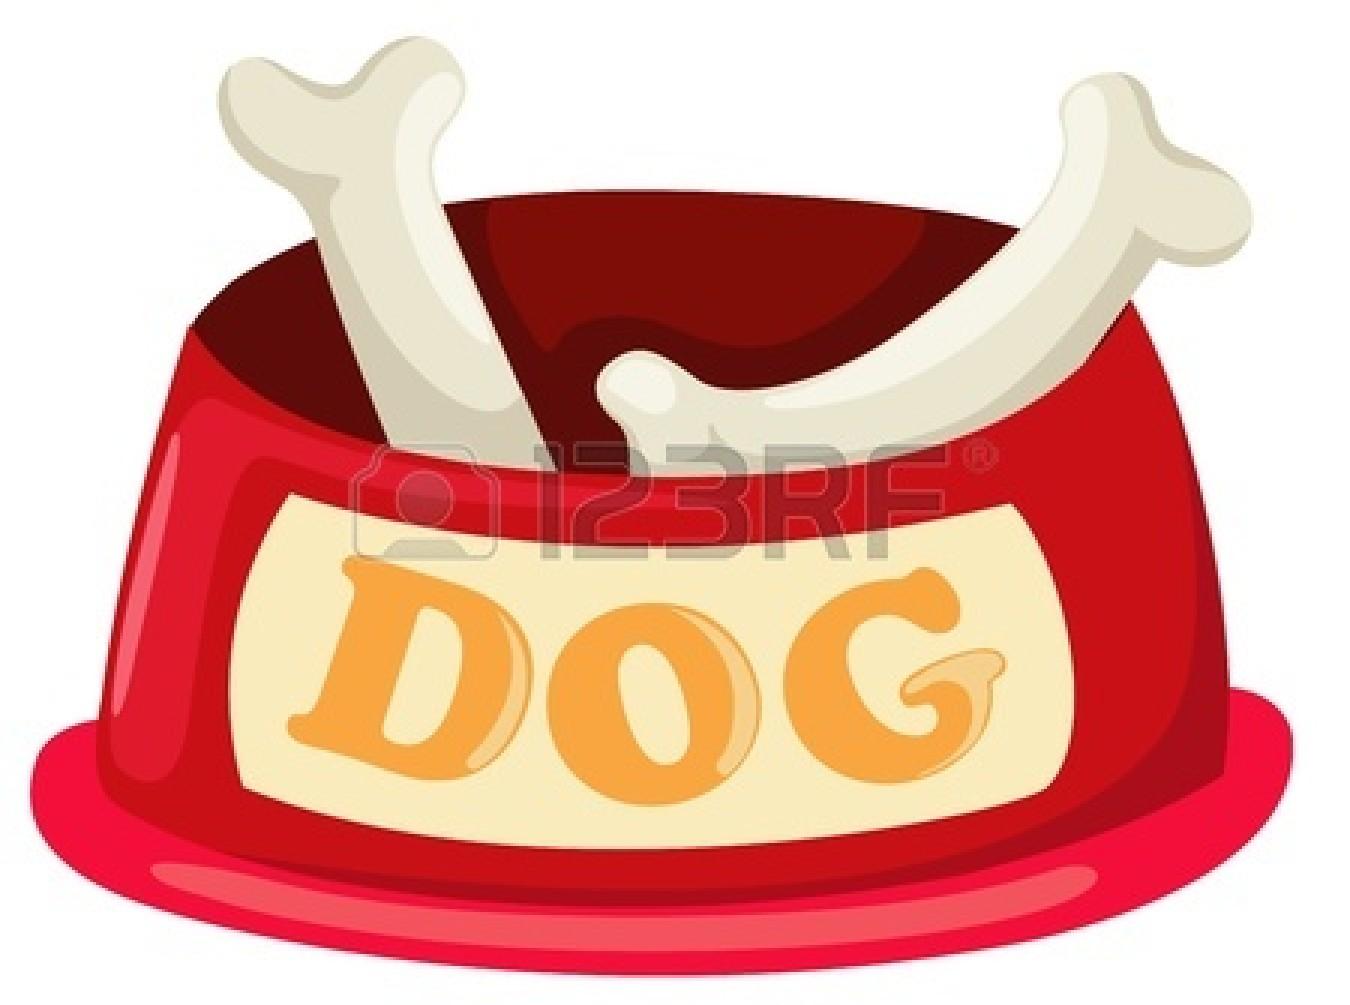 Dog Bone In Bowl Clipart 1762 - Dog Bowl Clipart